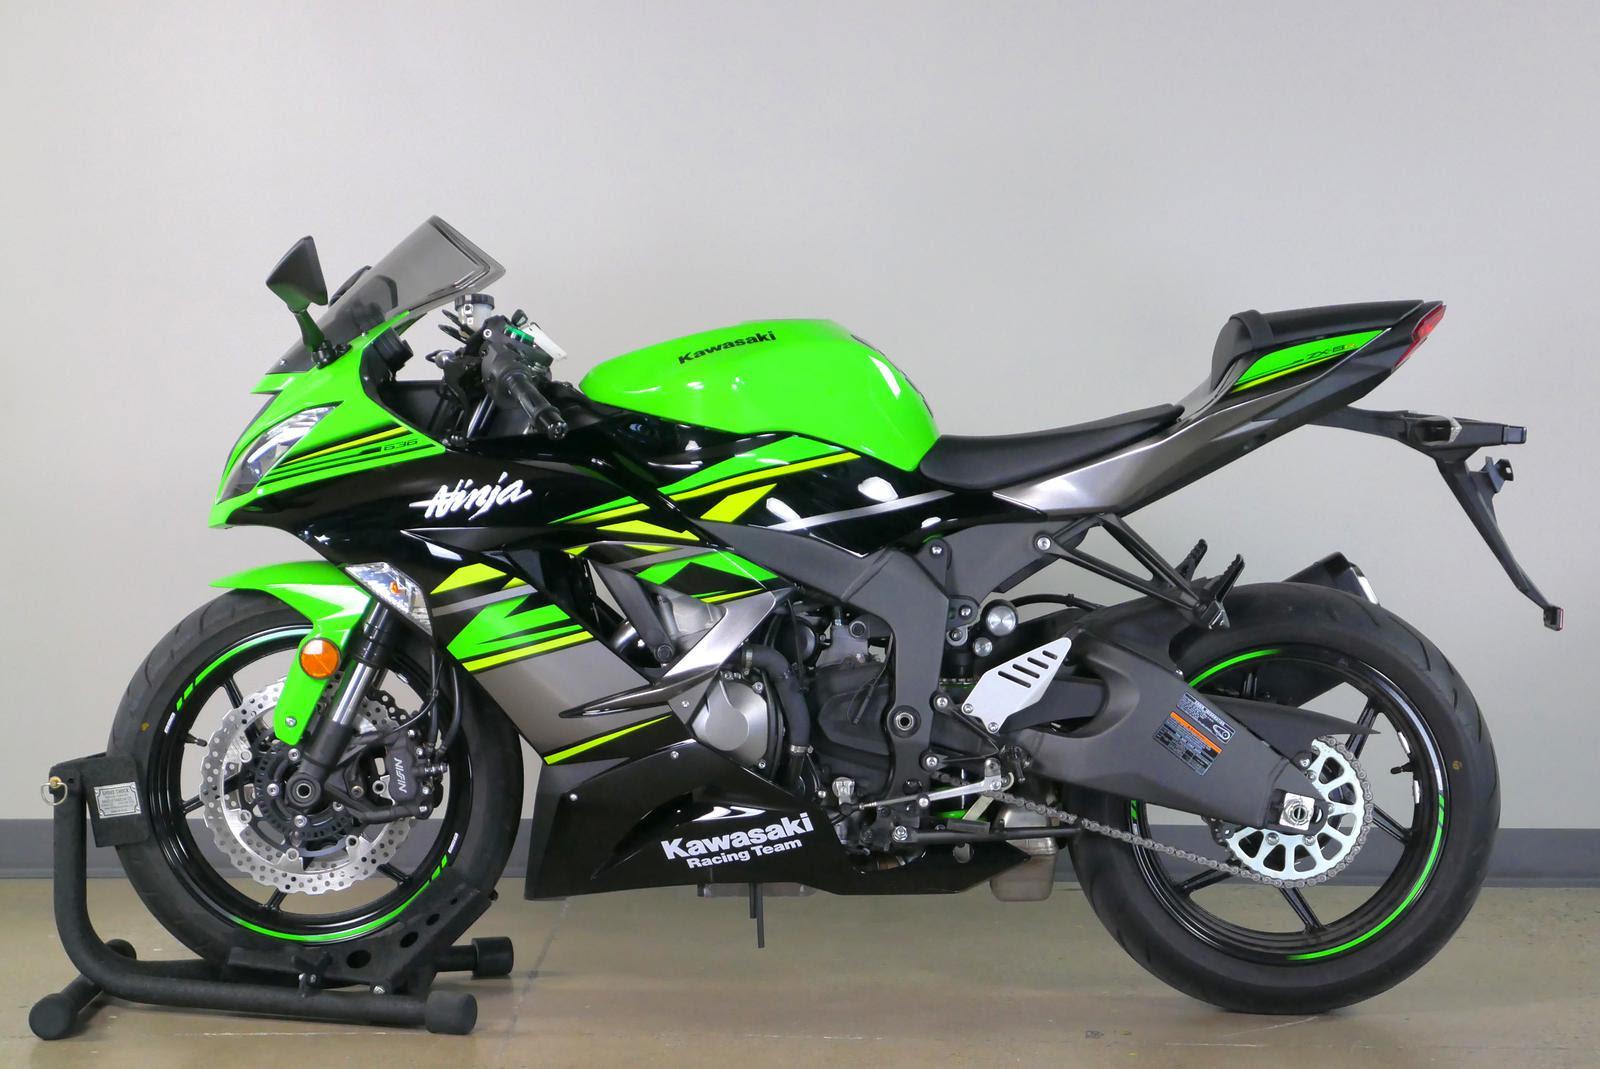 2018 Kawasaki Ninja Zx 6r Abs Krt Edition For Sale In